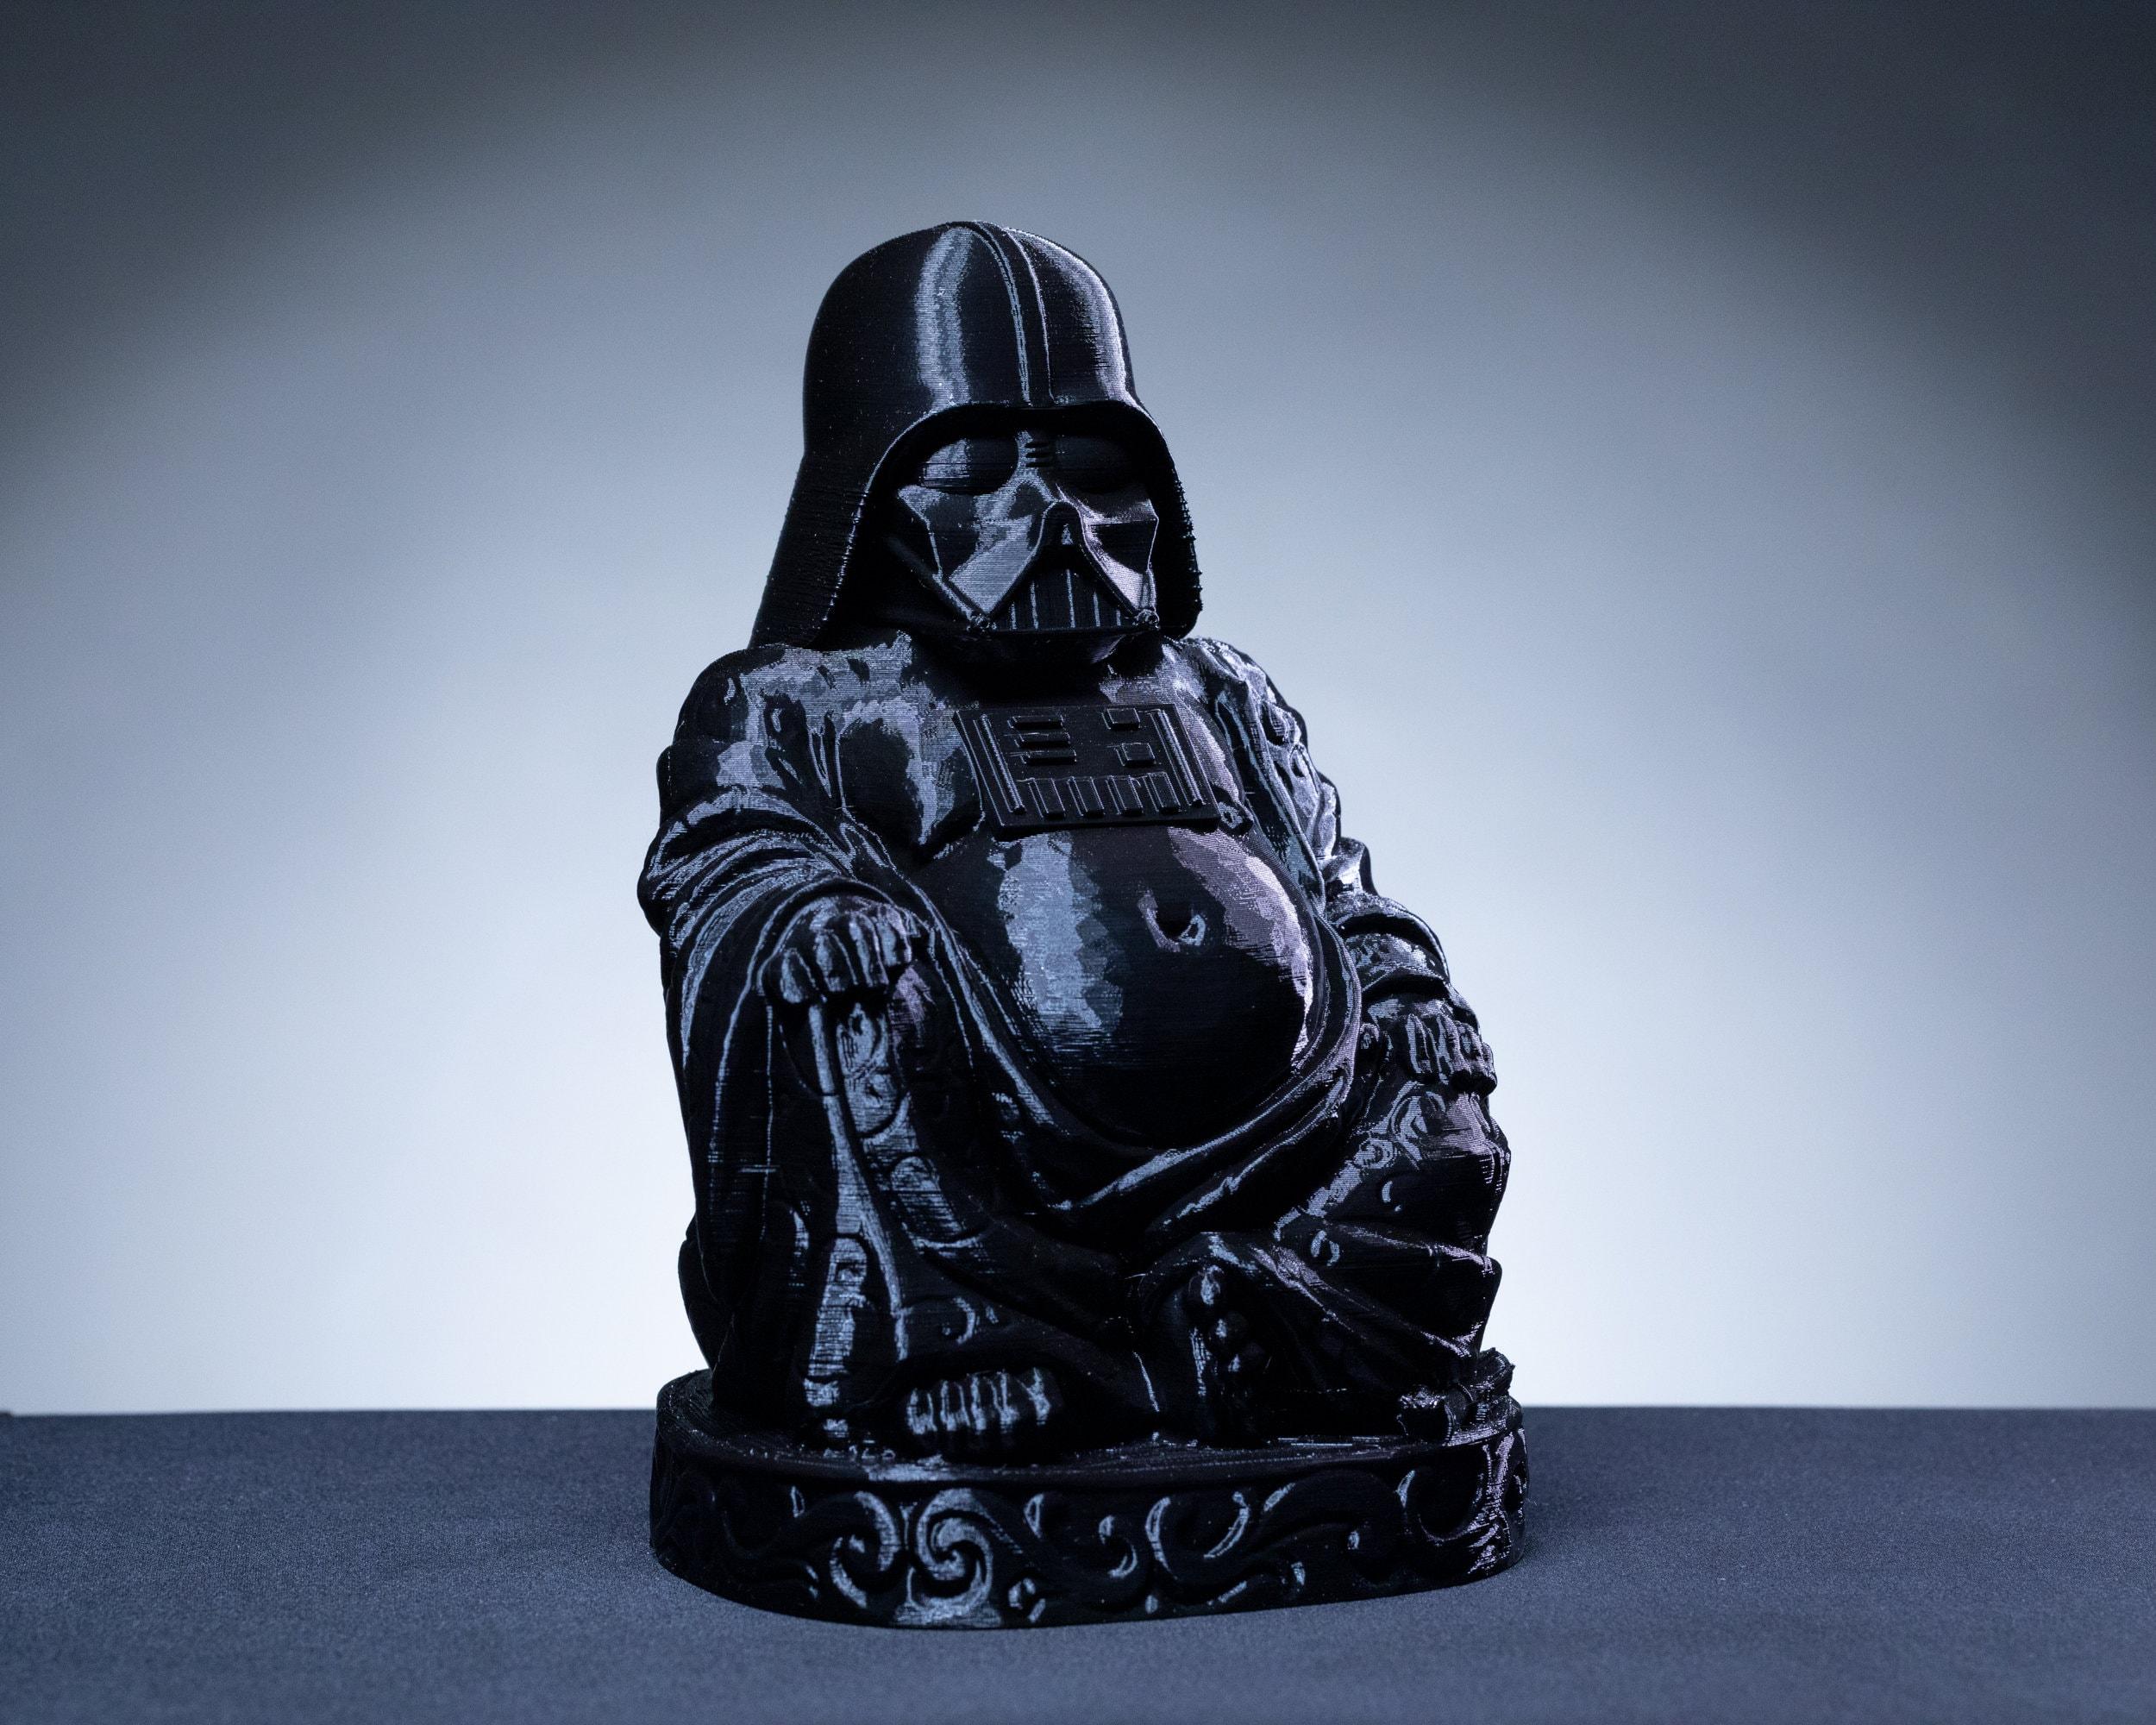 DARTH VADER BUDDHA 3D Print Figure Star Wars 3D Print Sculpture